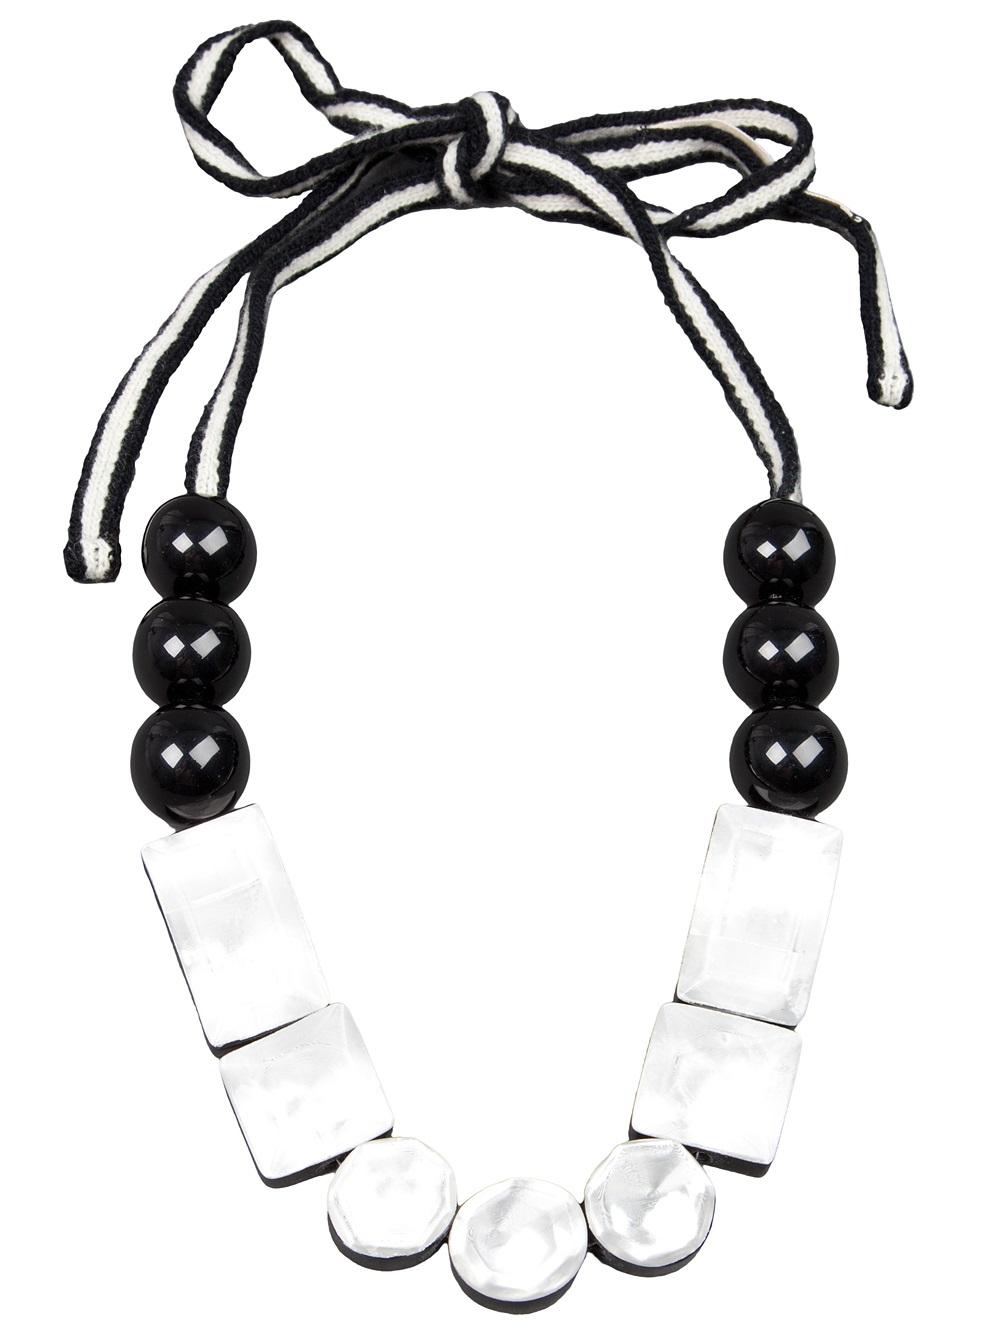 Marni silk resin pendant necklaces - Black arEAZ